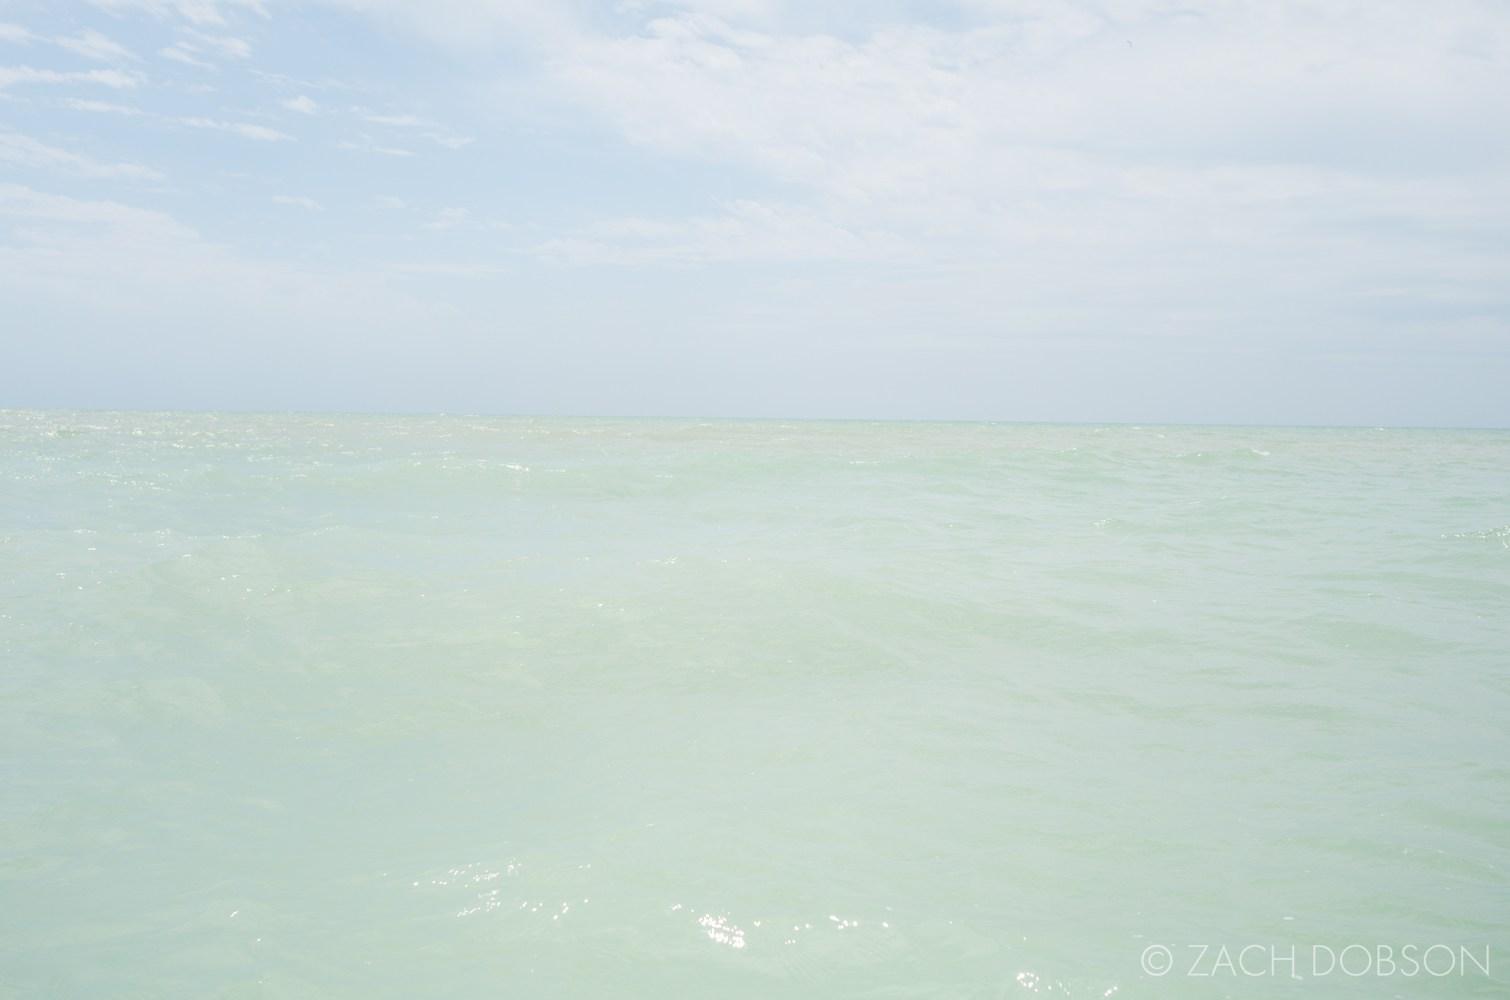 minimalist sky and sea